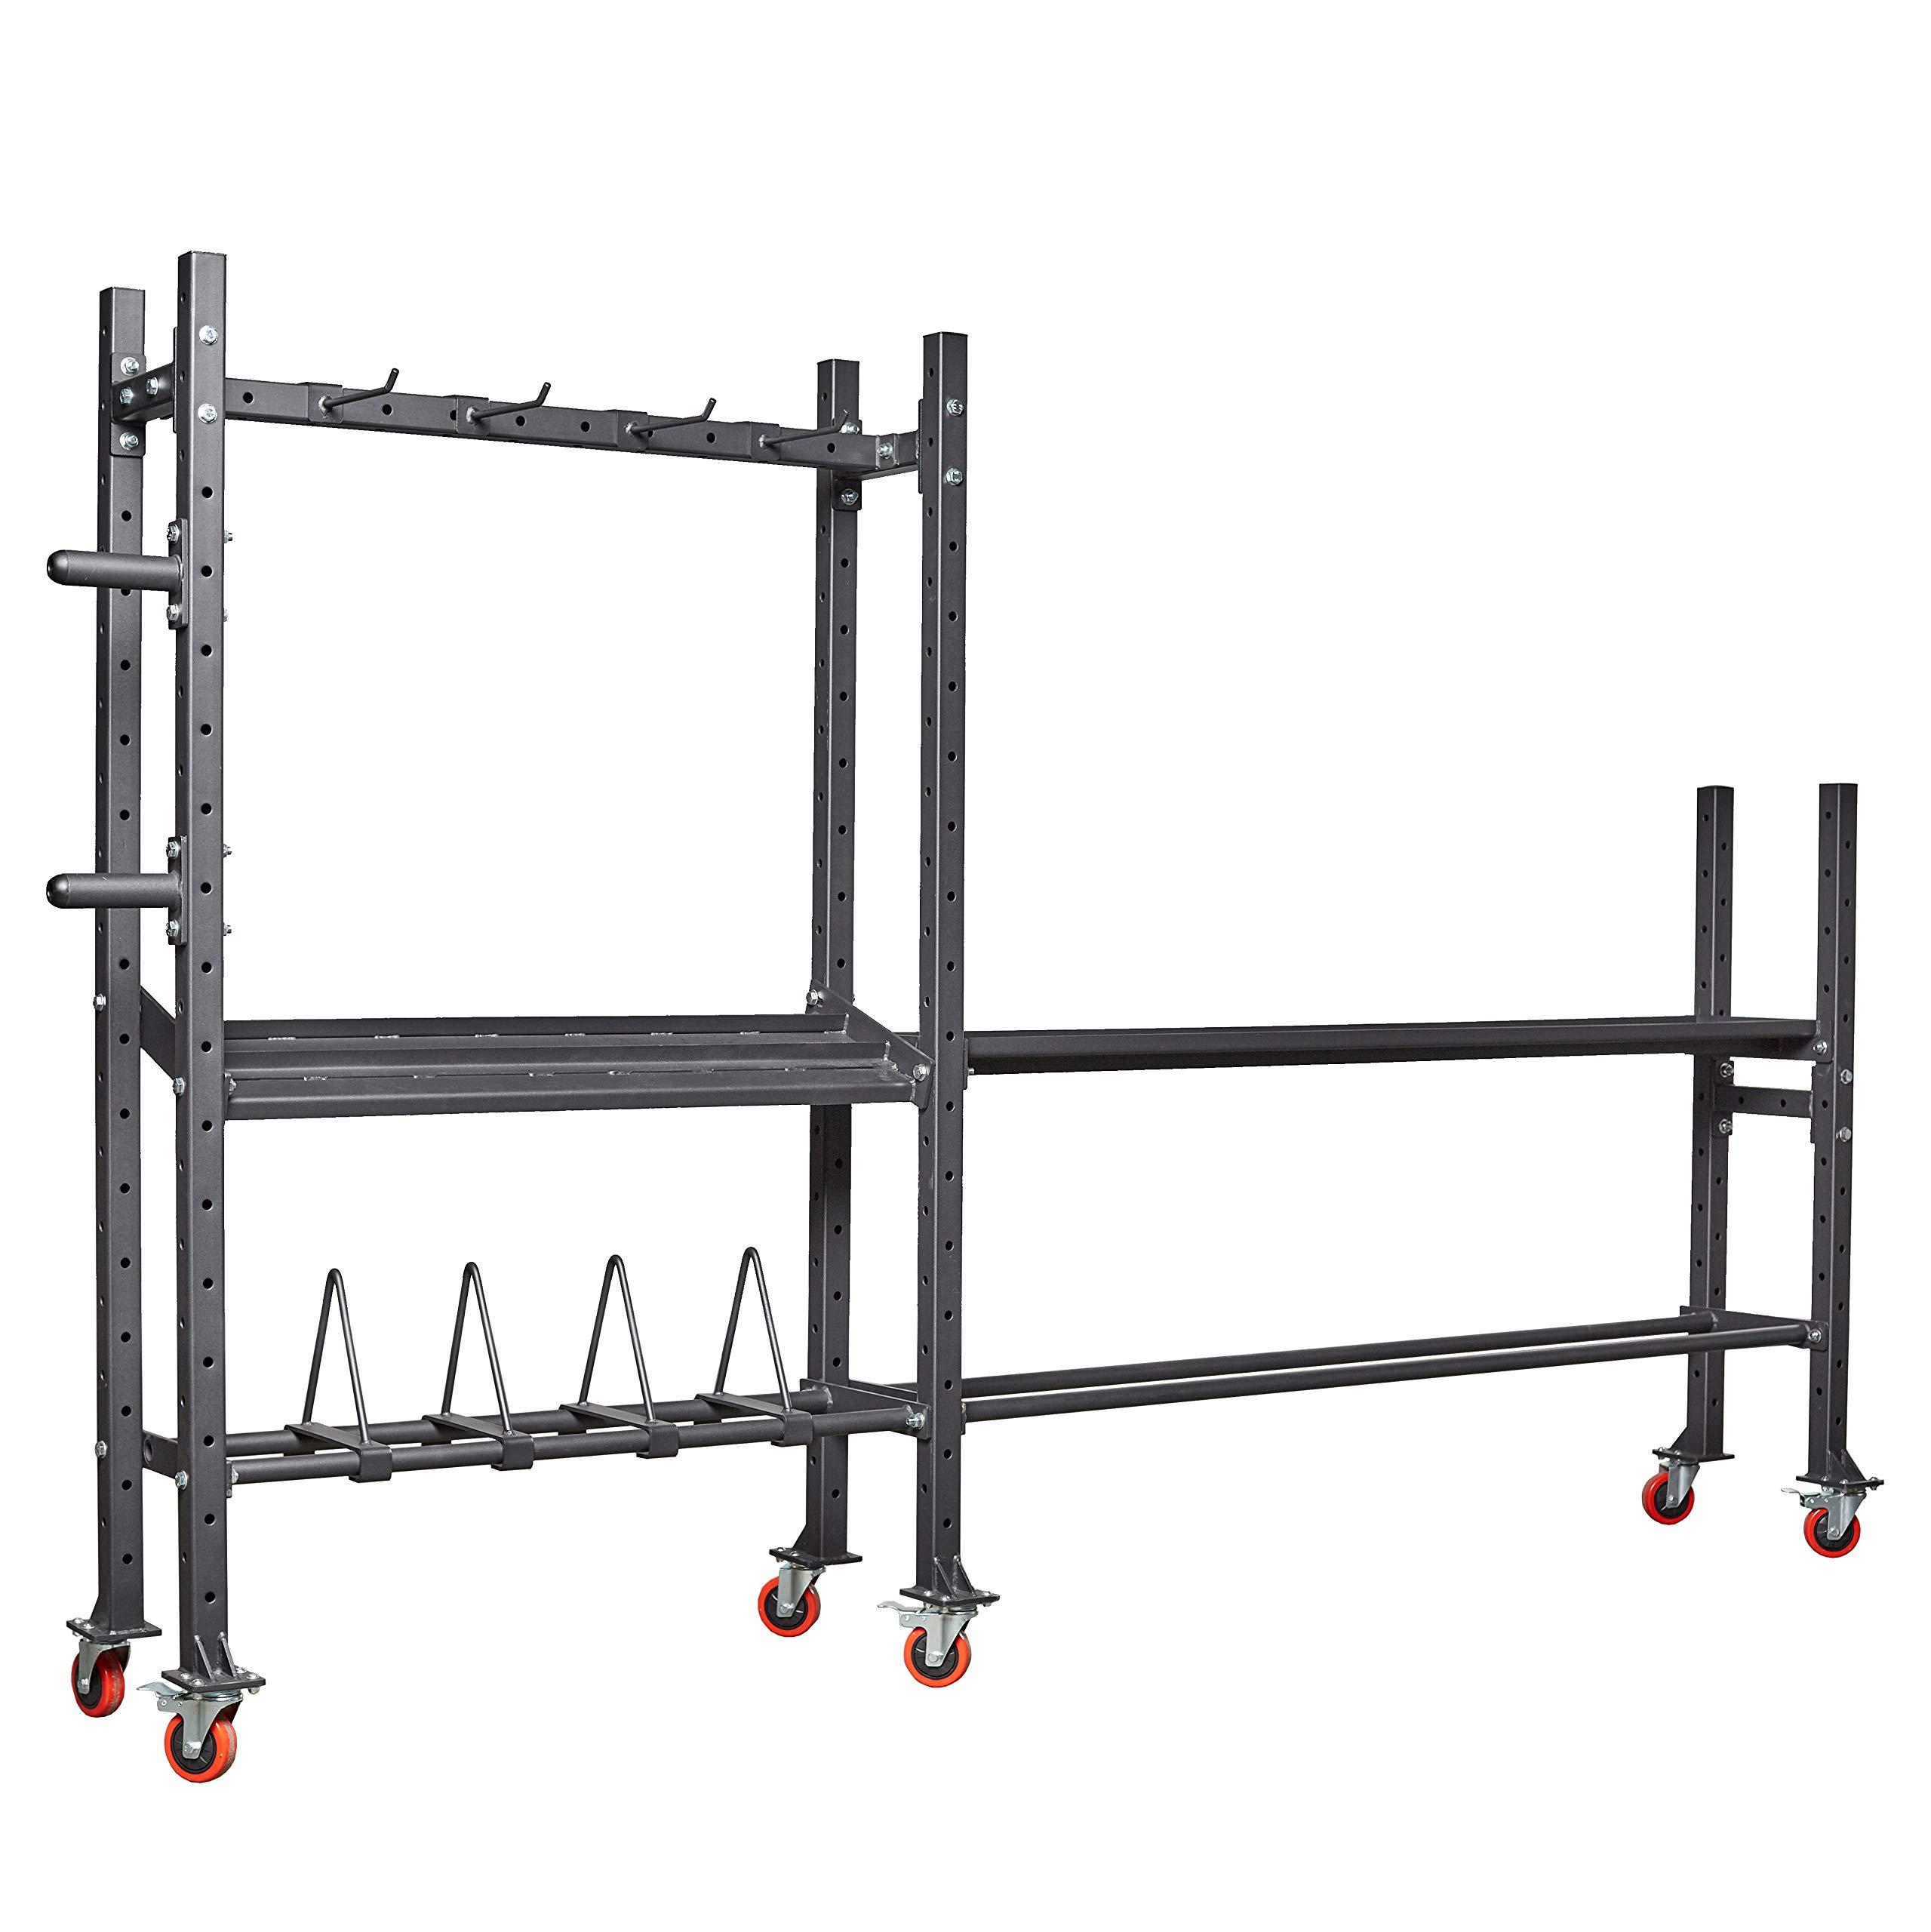 REP Modular Storage System - MSS2